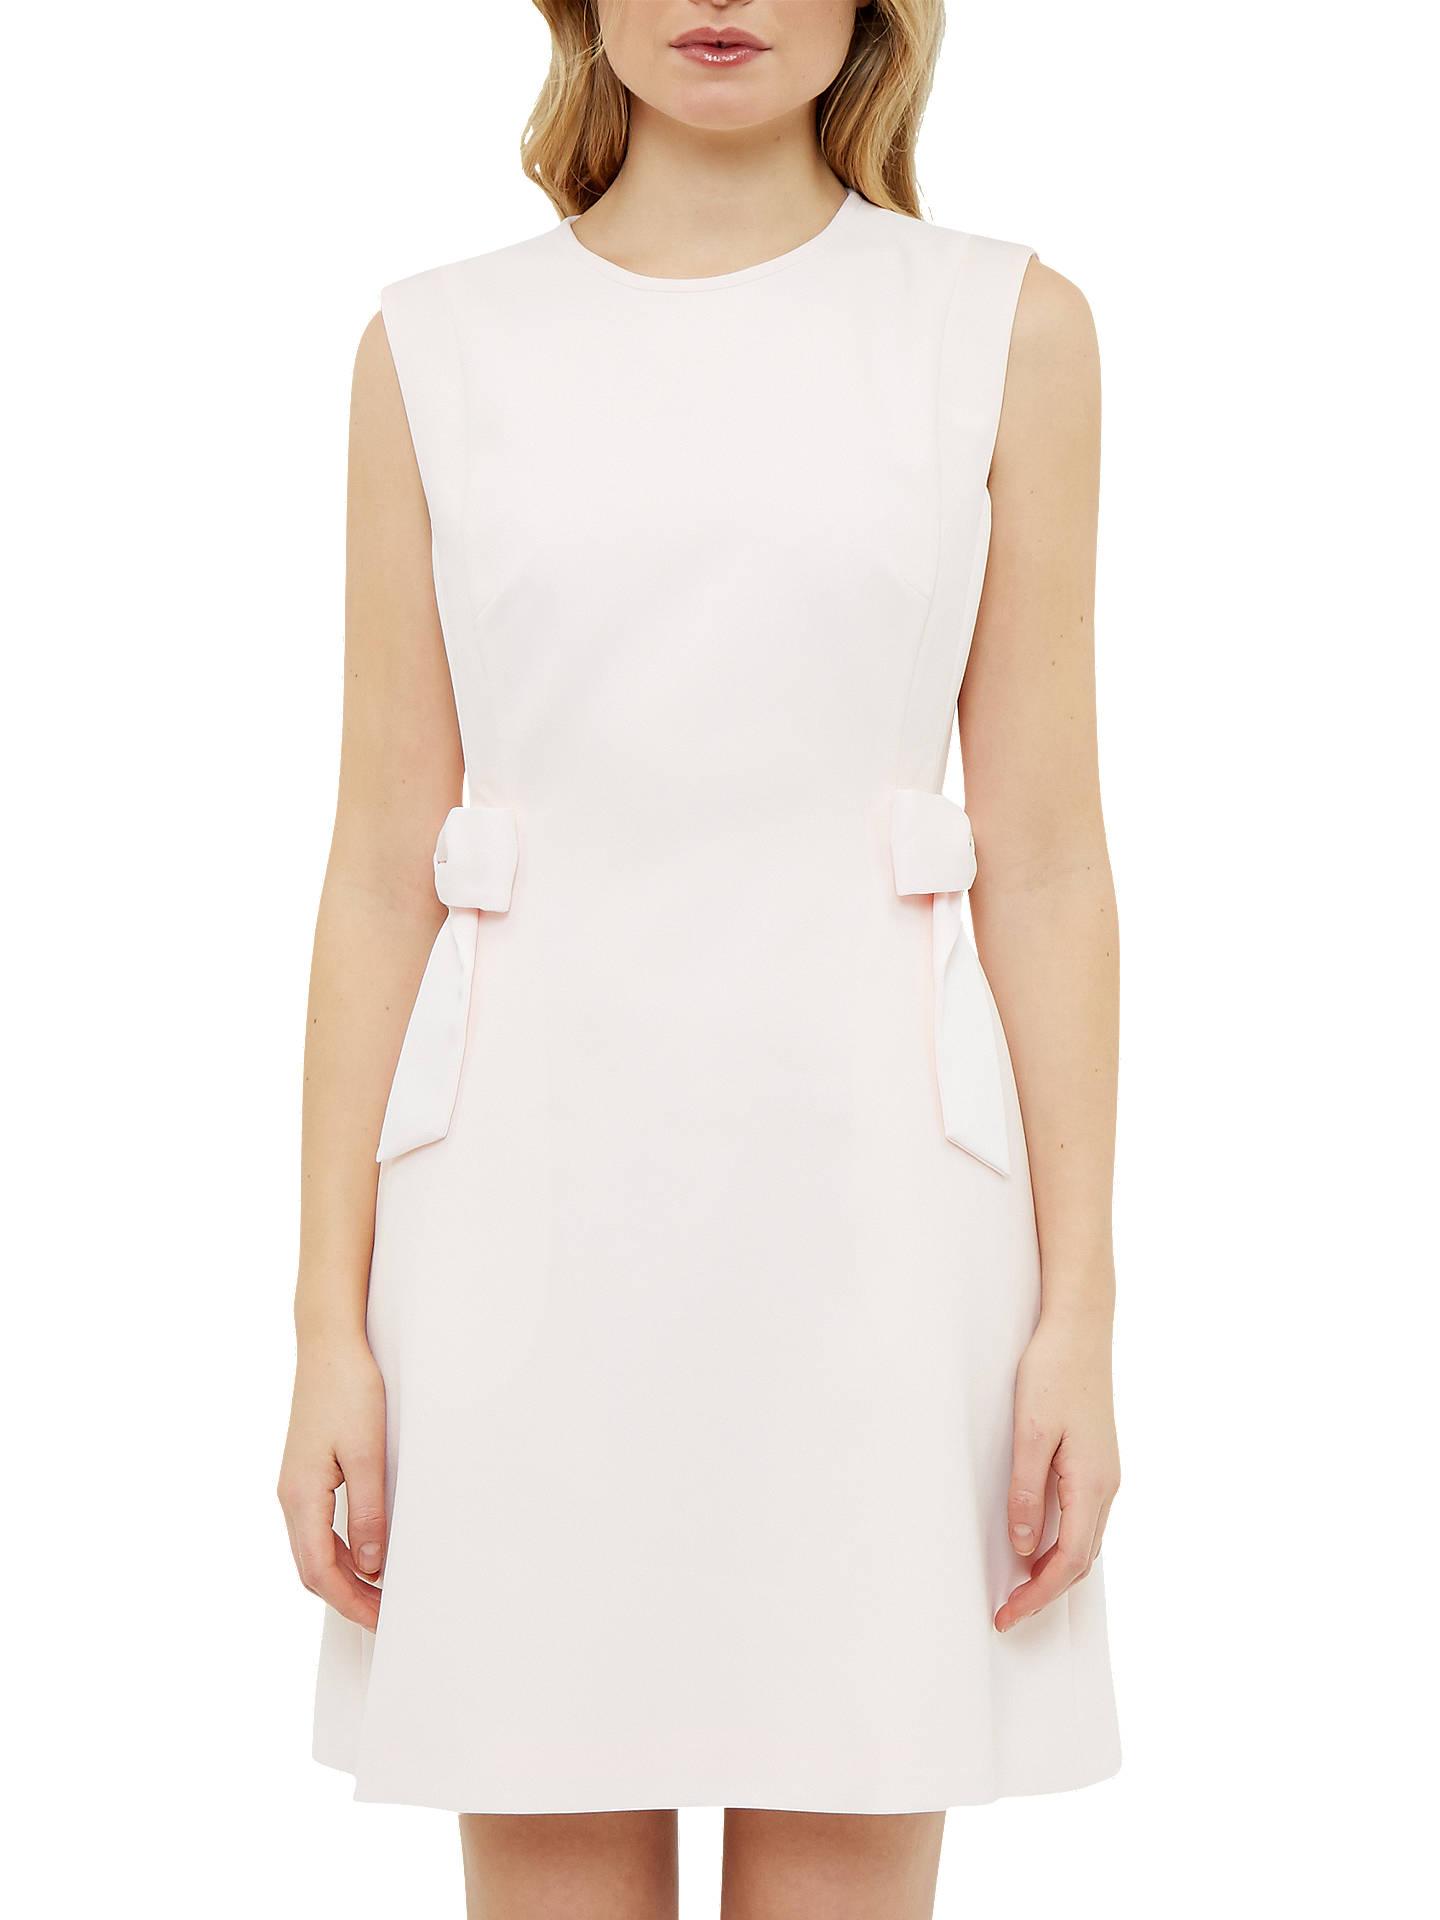 06b2e89a11a9 Buy Ted Baker Meline Side Bow Detail Shift Dress